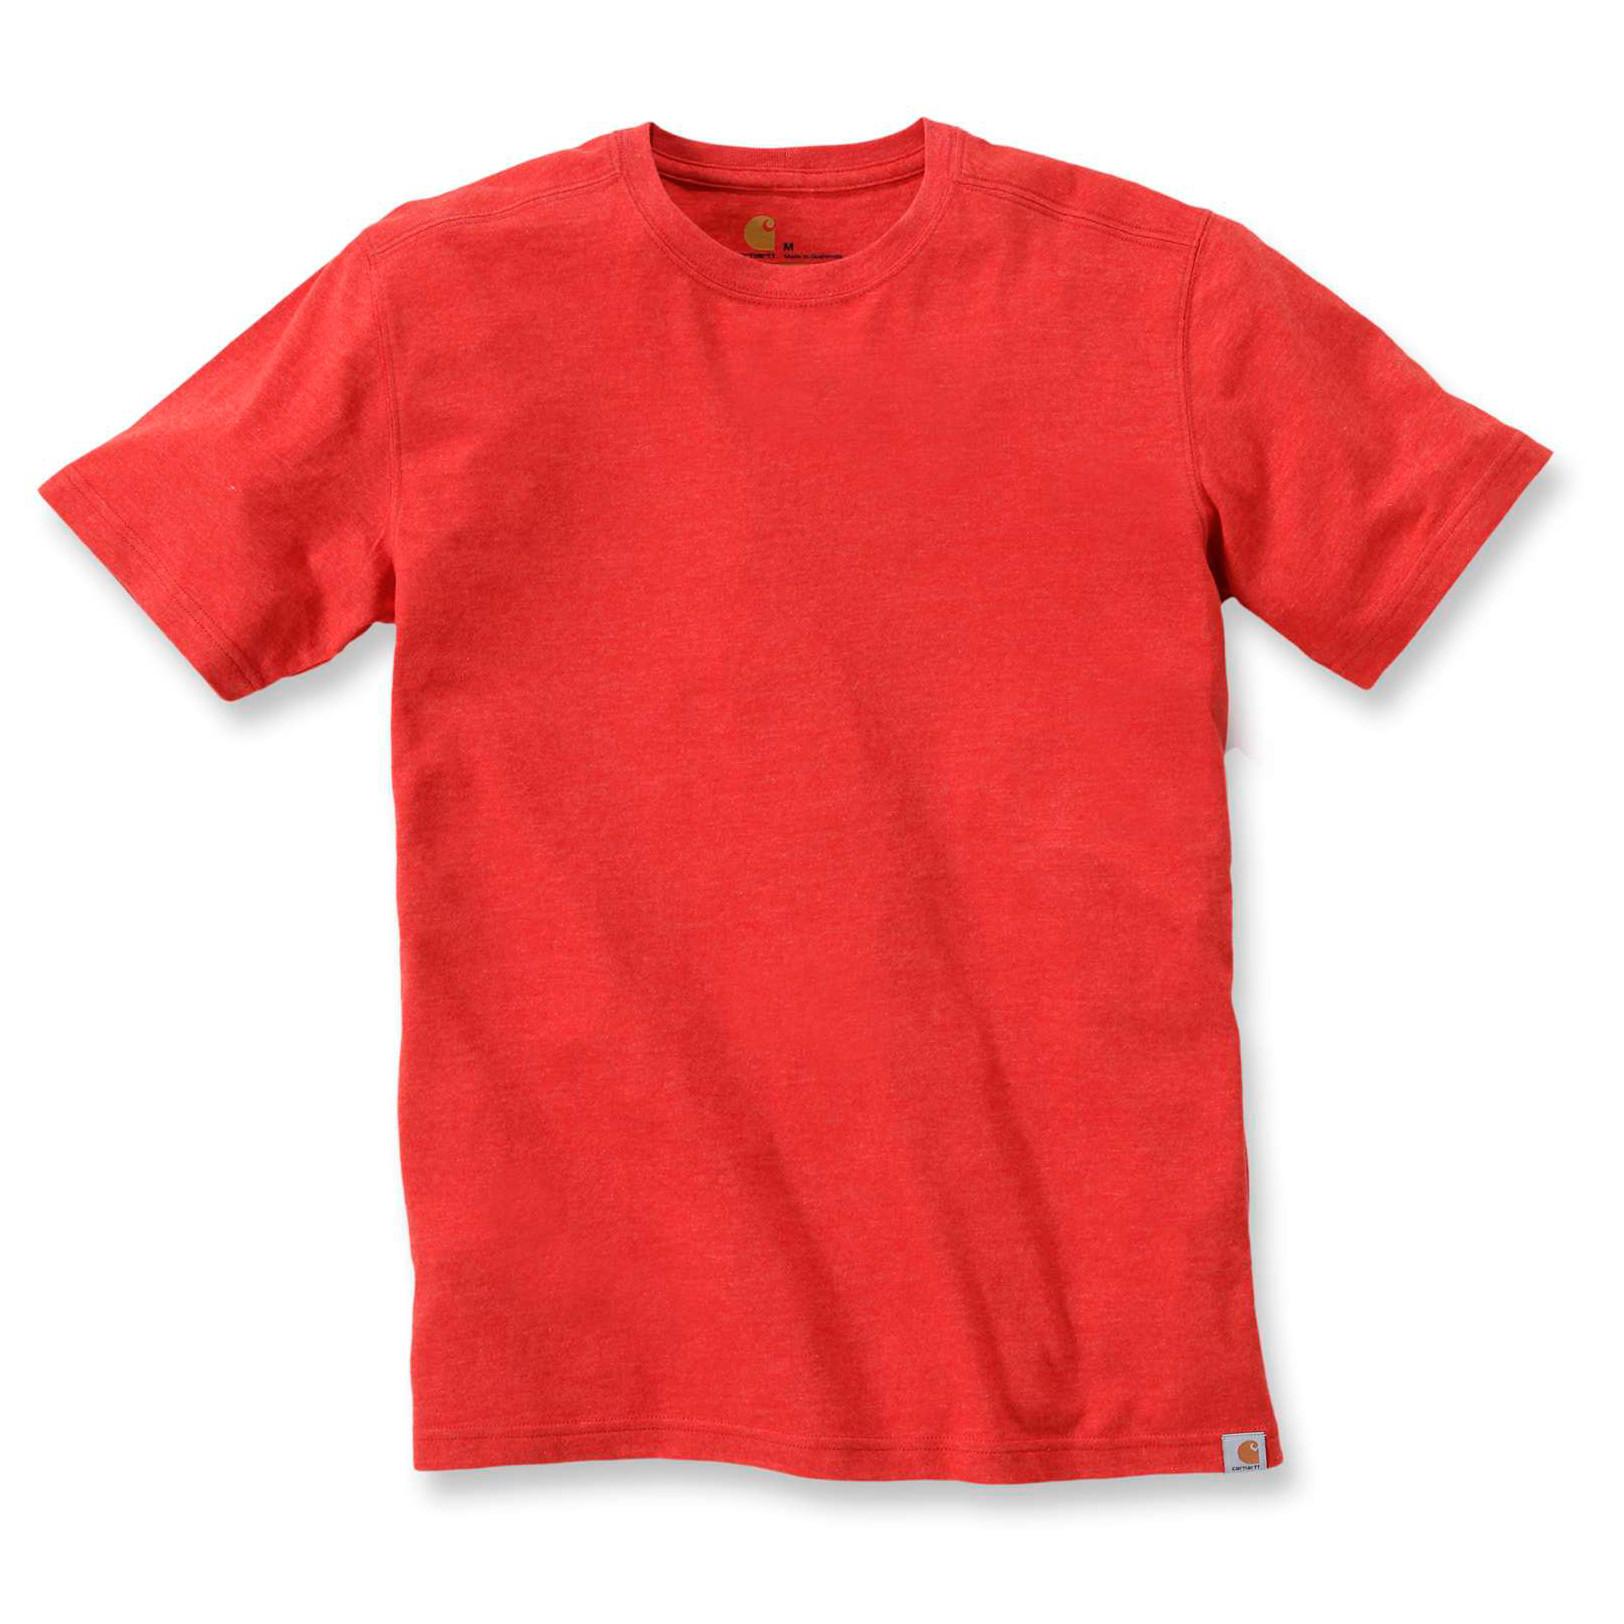 Футболка Carhartt Maddock T-Shirt S/S - 101124 (Chili Heather, L)